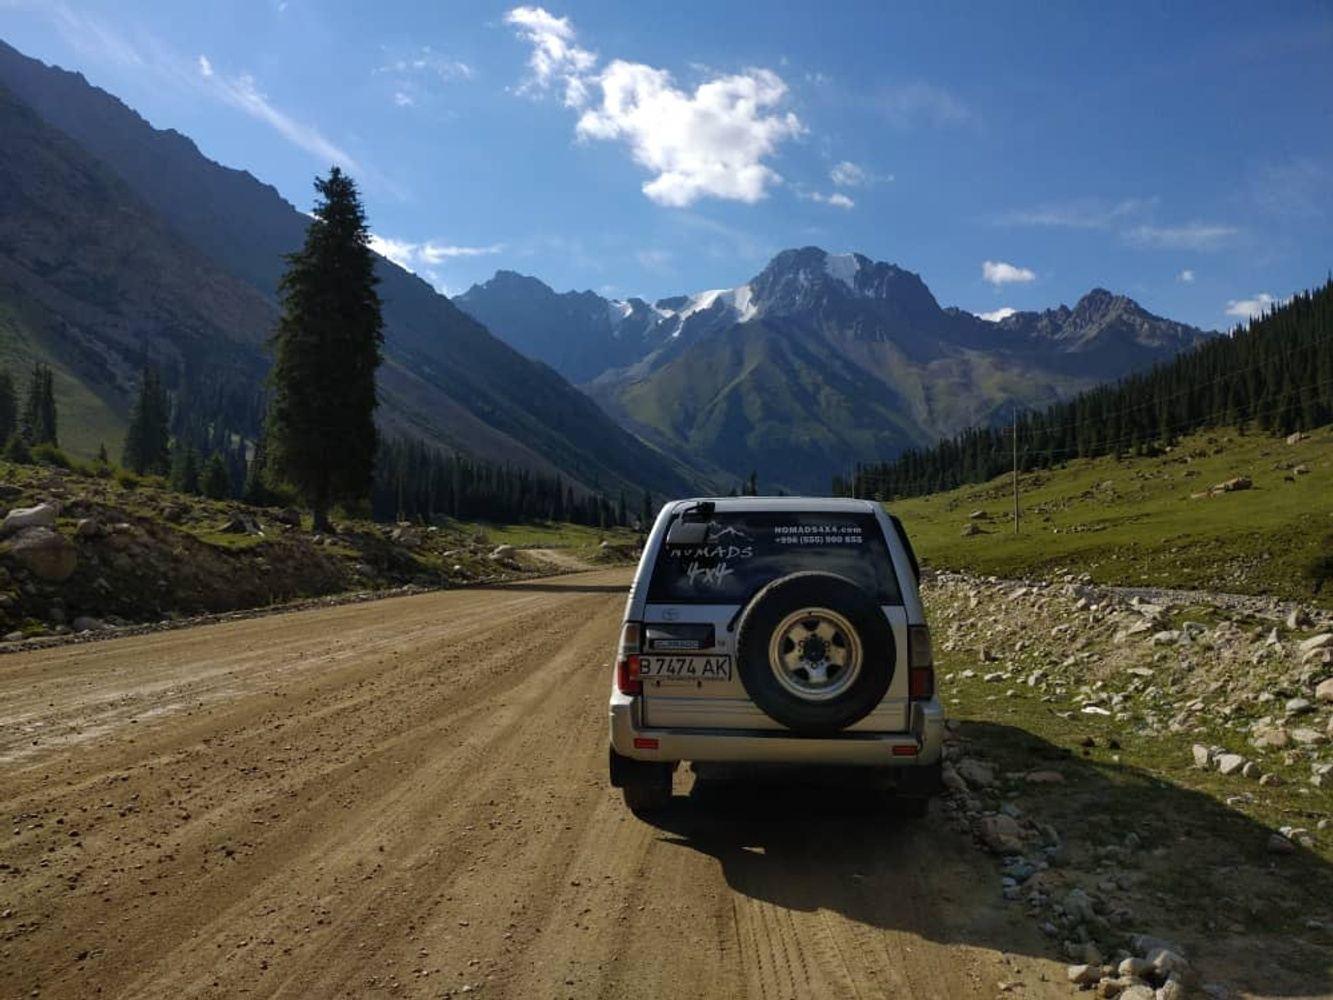 South Kazakhstan and North Kyrgyzstan circle tour - 12 days